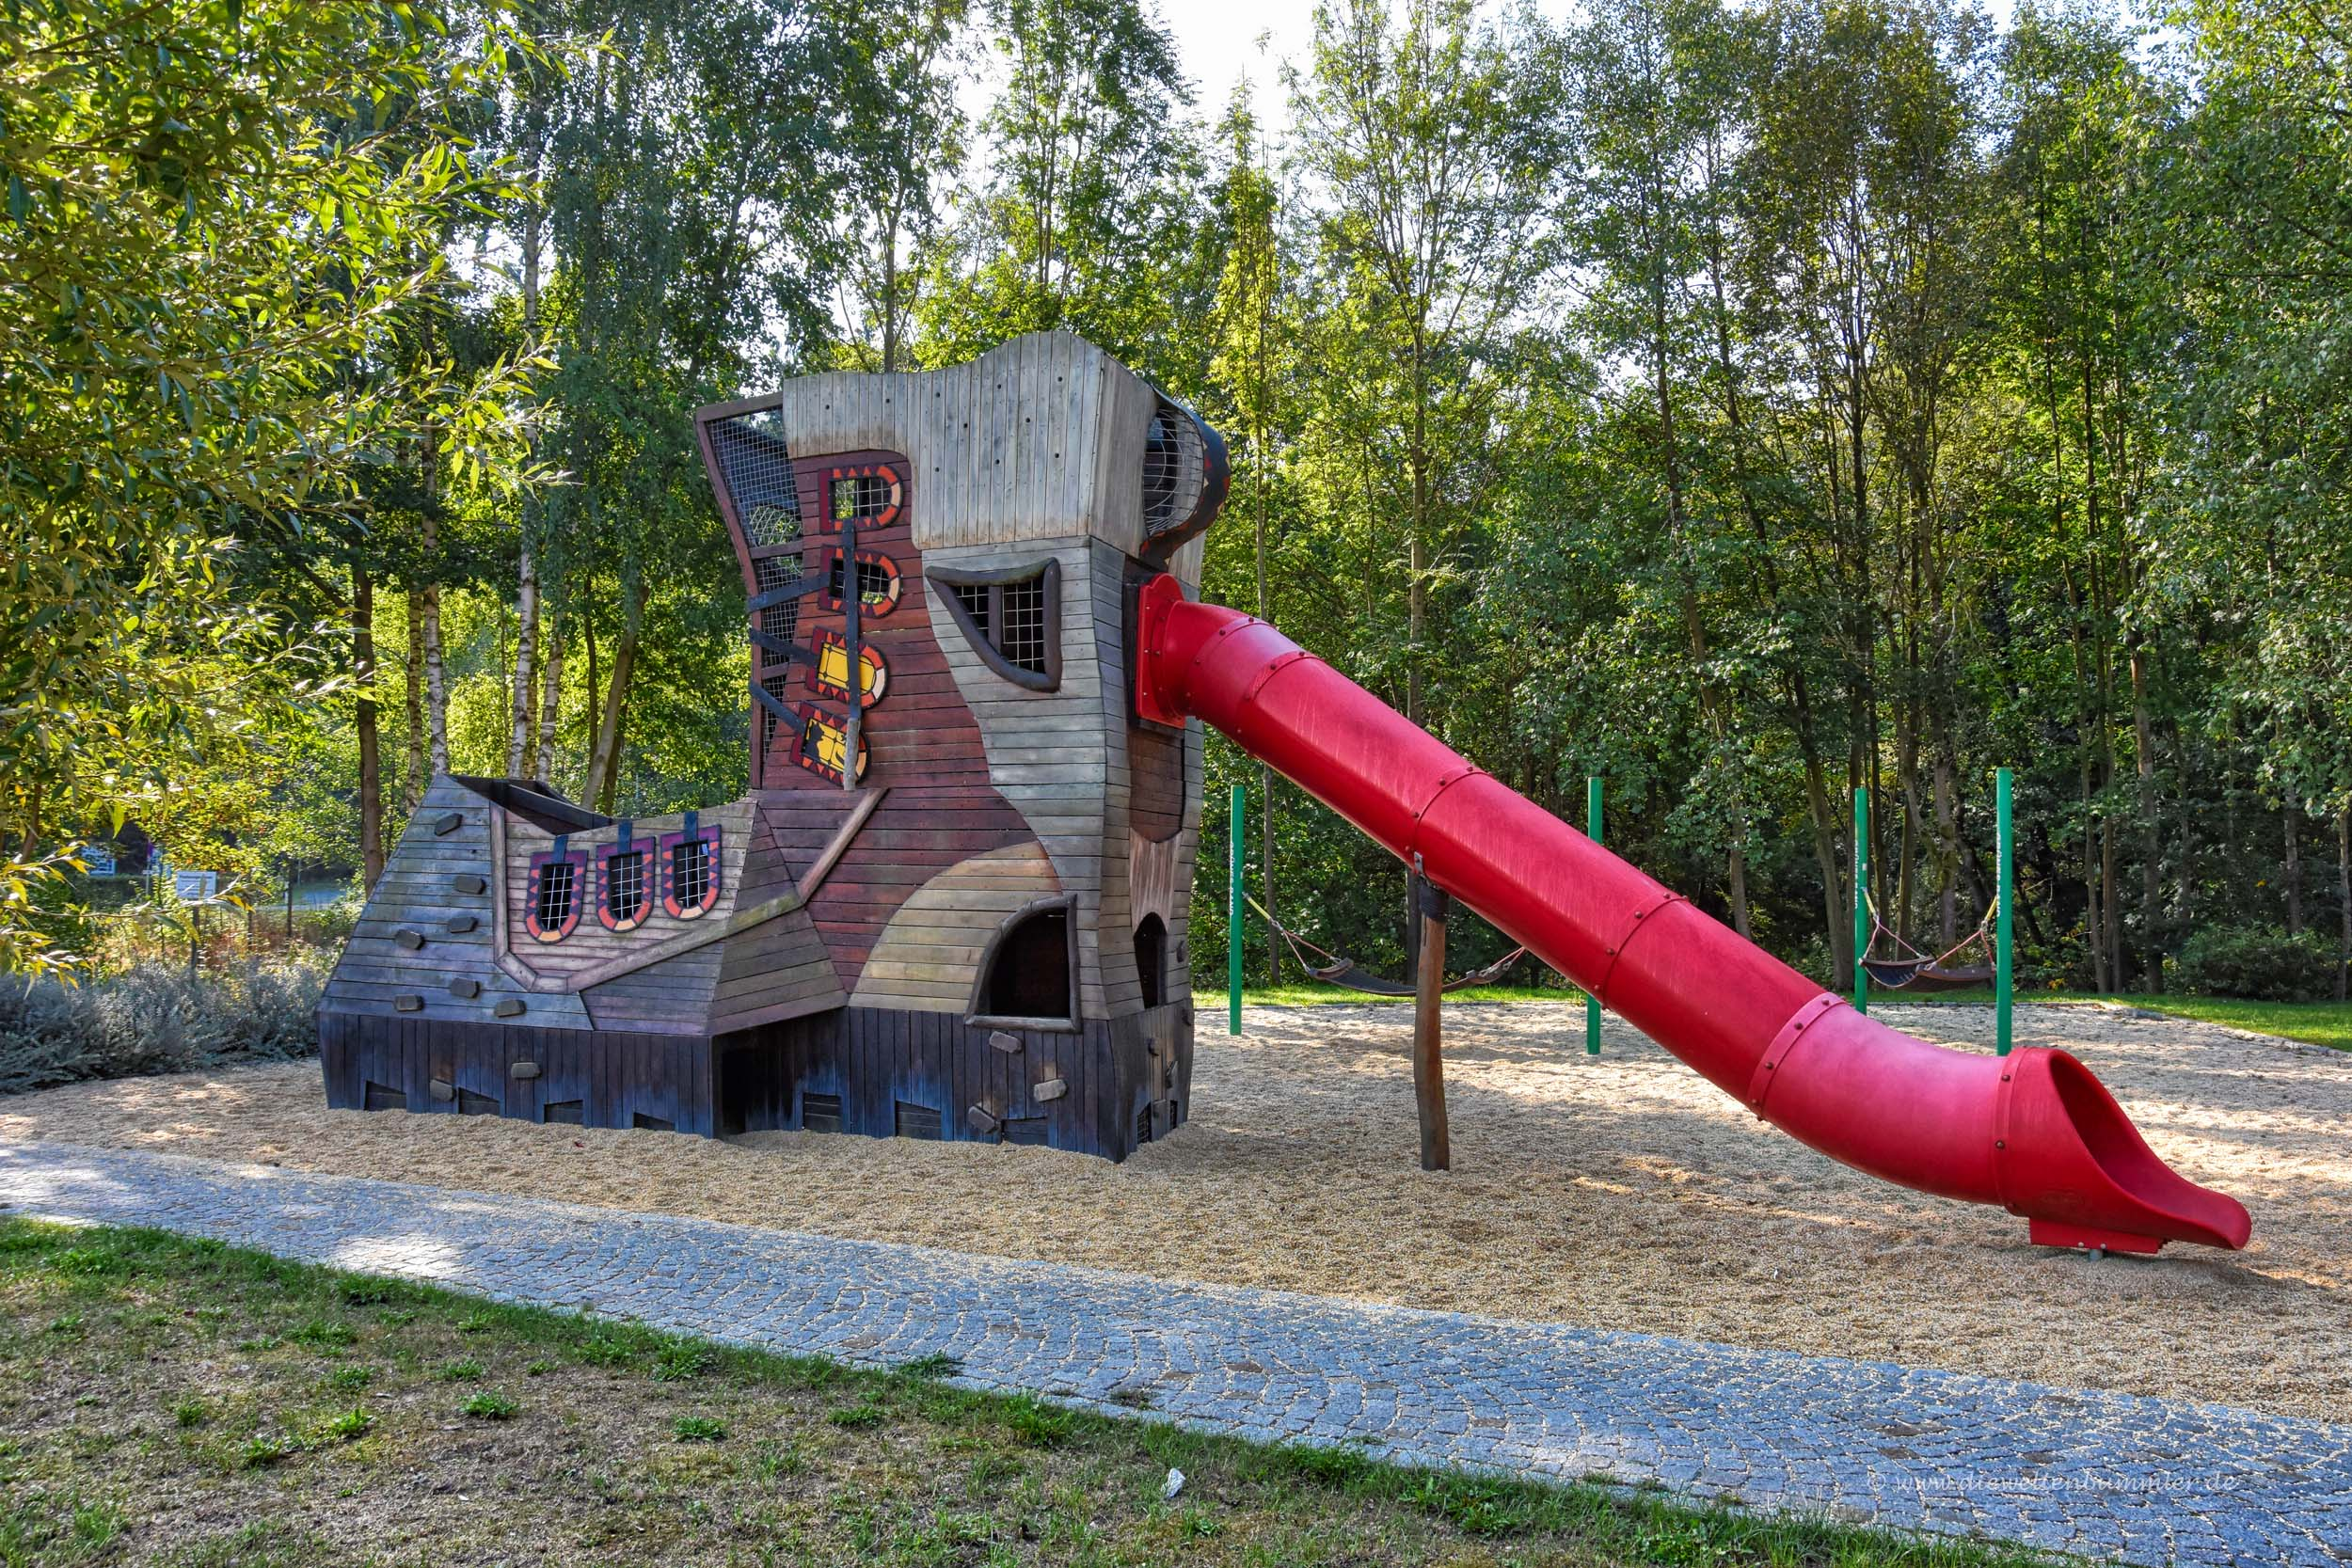 Riesiger Wanderschuh als Spielplatz